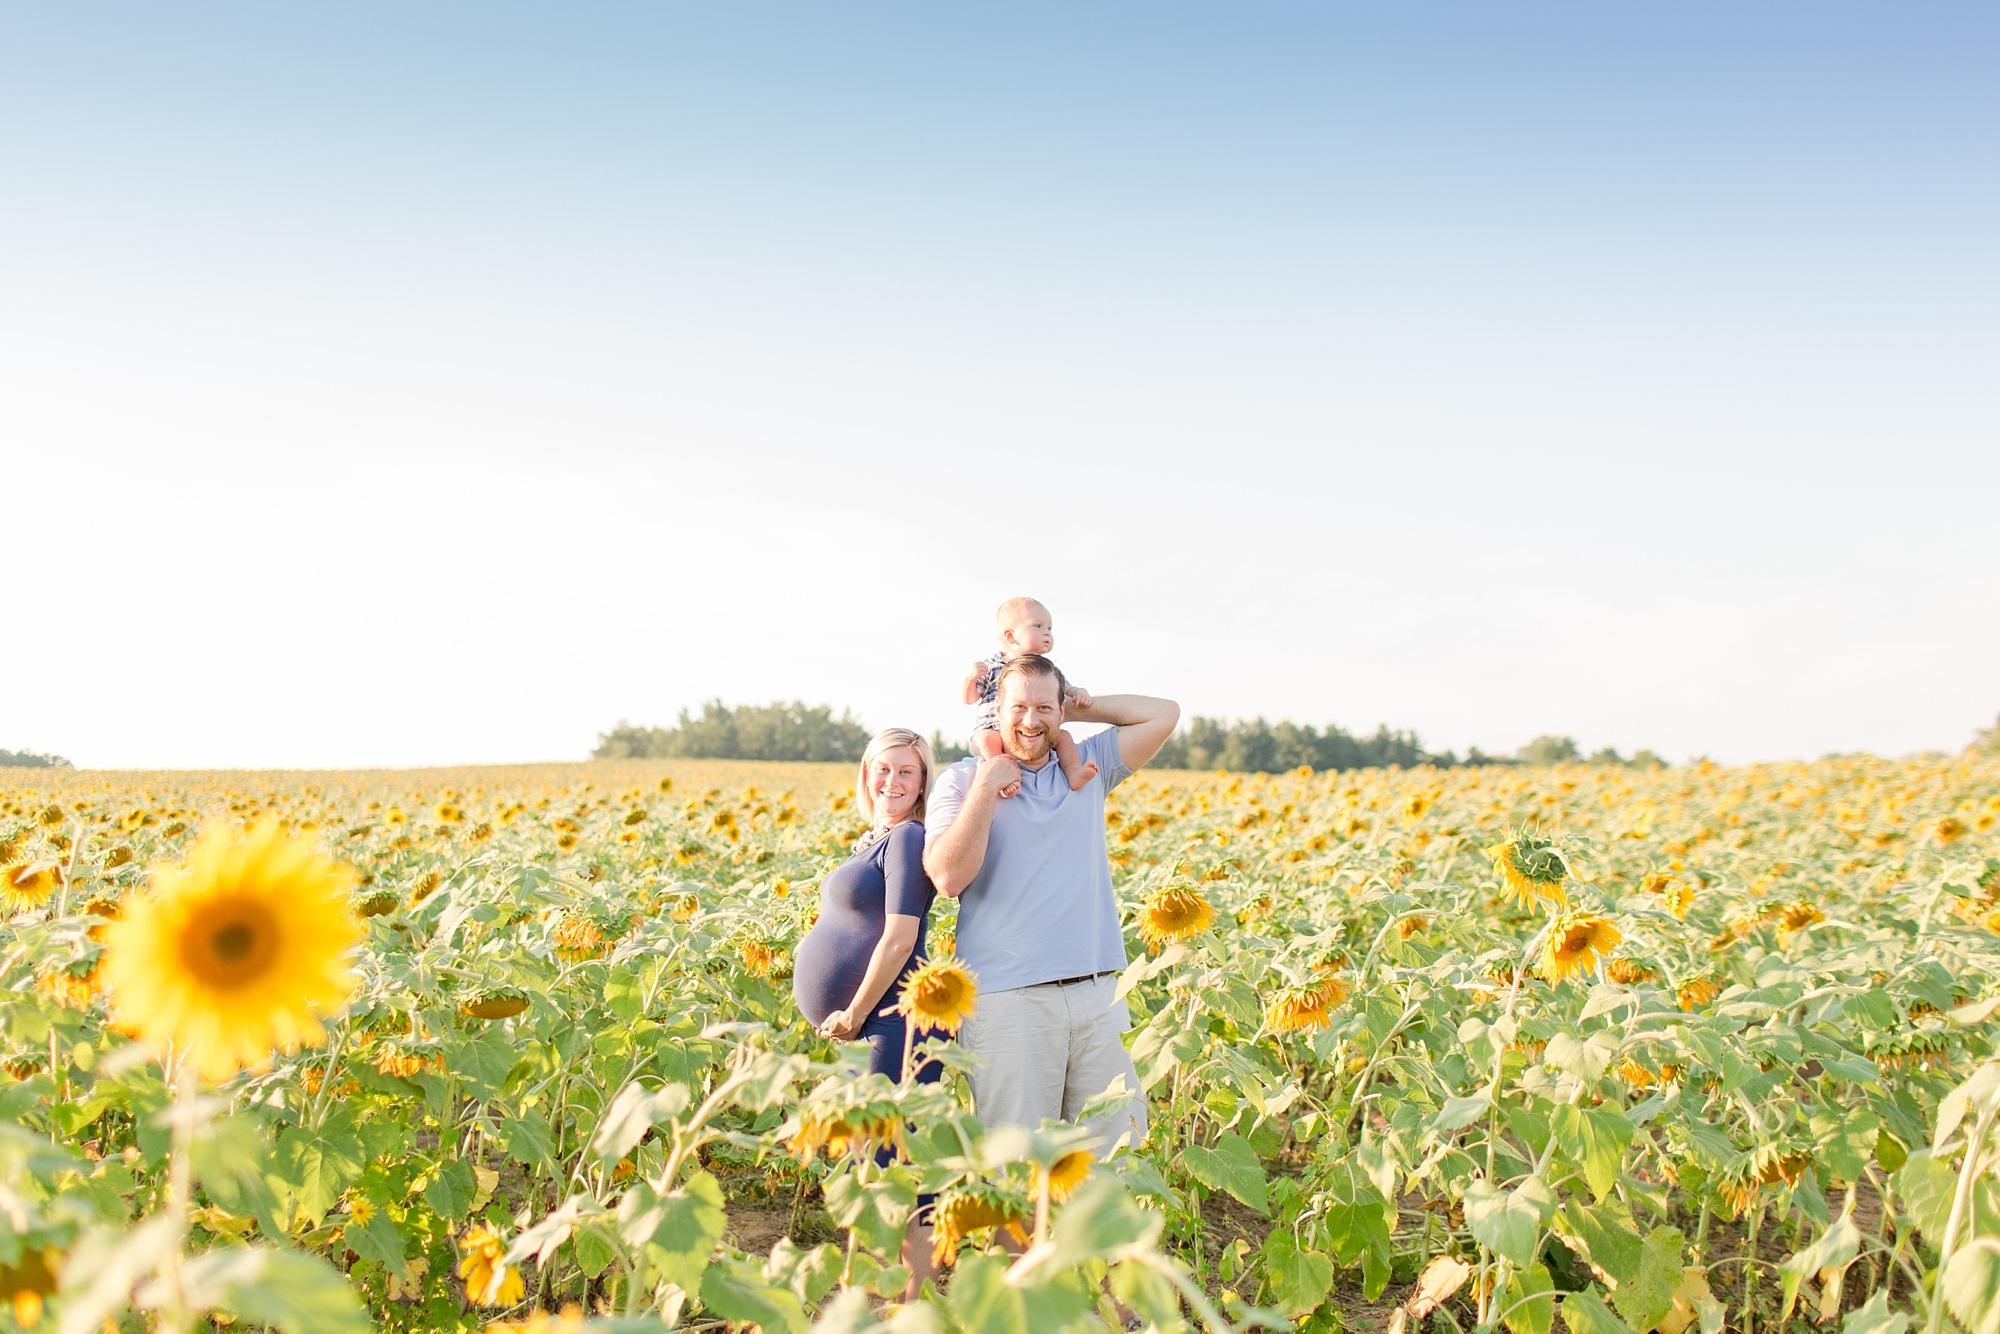 Andrews Family 2016-123_anna grace photography baltimore maryland maternity family photographer sunflower field photo.jpg